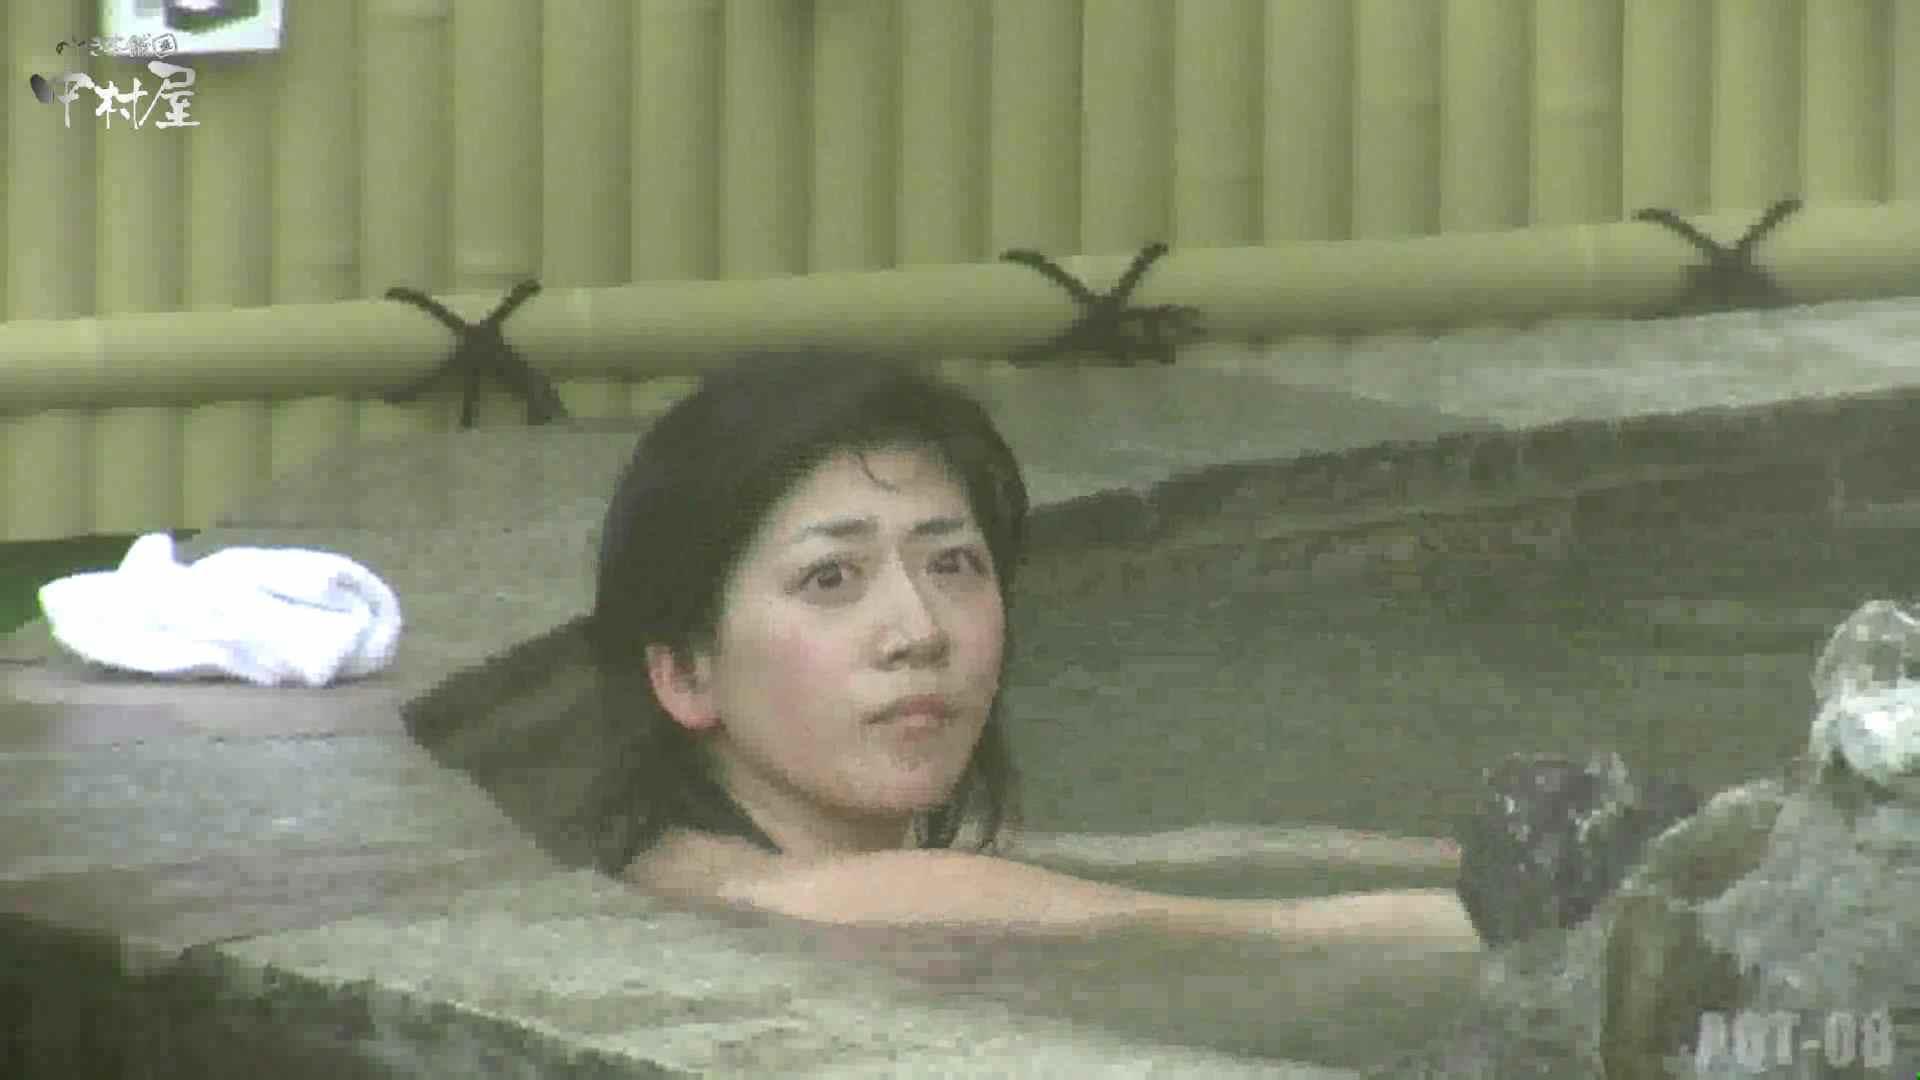 Aquaな露天風呂Vol.872潜入盗撮露天風呂八判湯 其の四 OL女体 | 女体盗撮  92連発 9